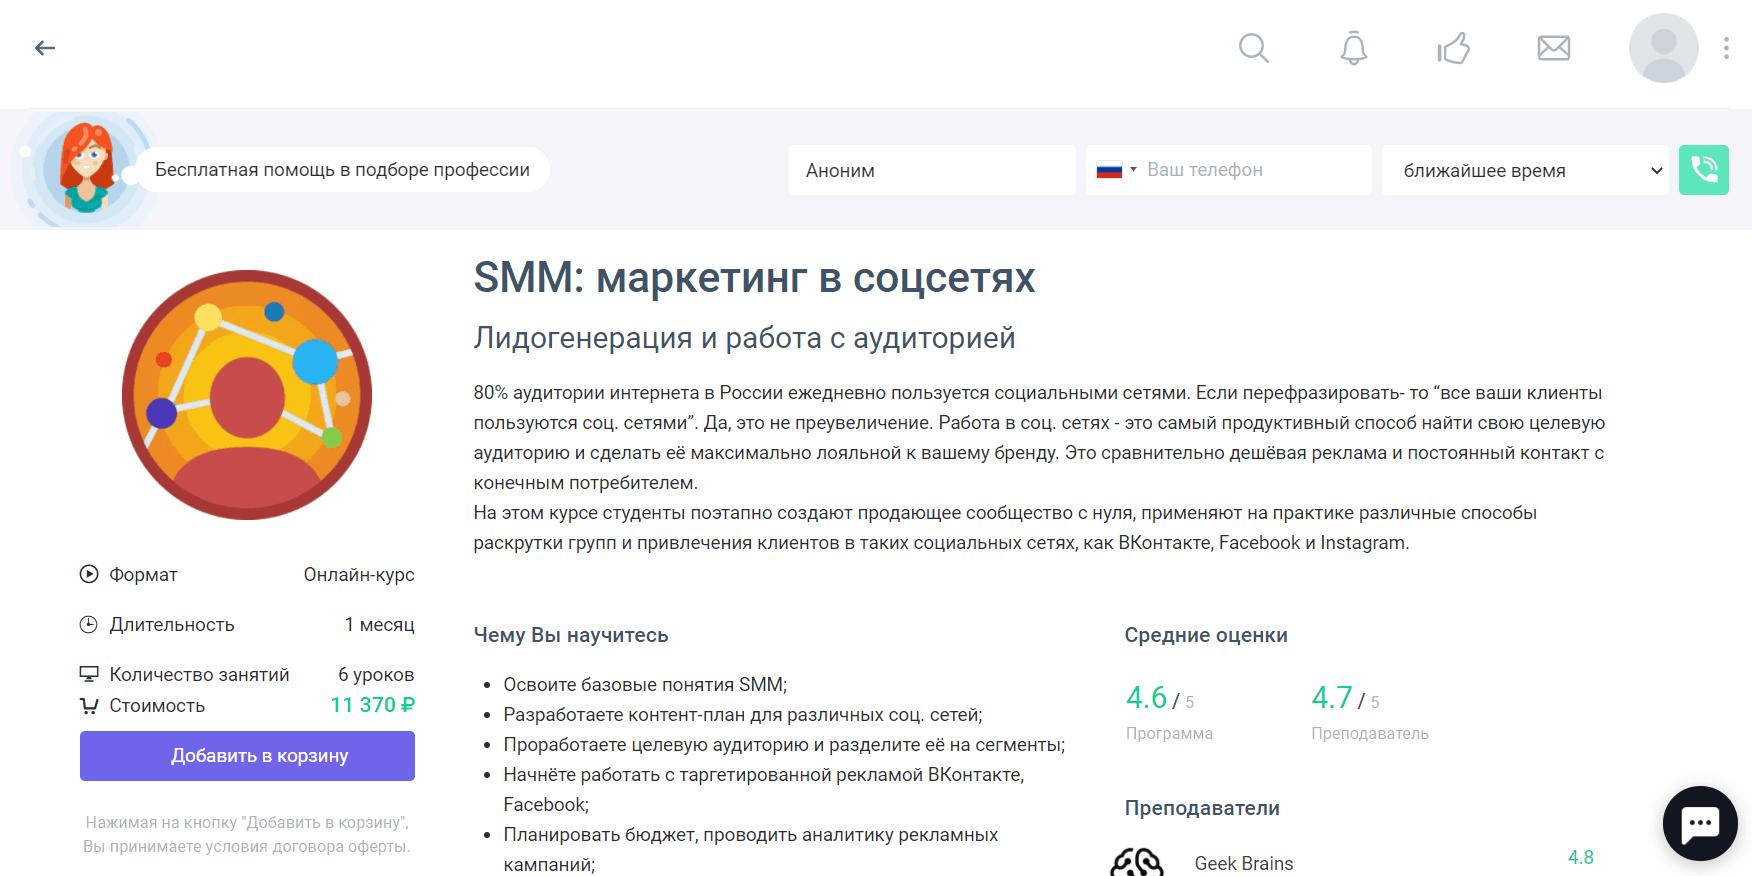 Онлайн-курс по SMM